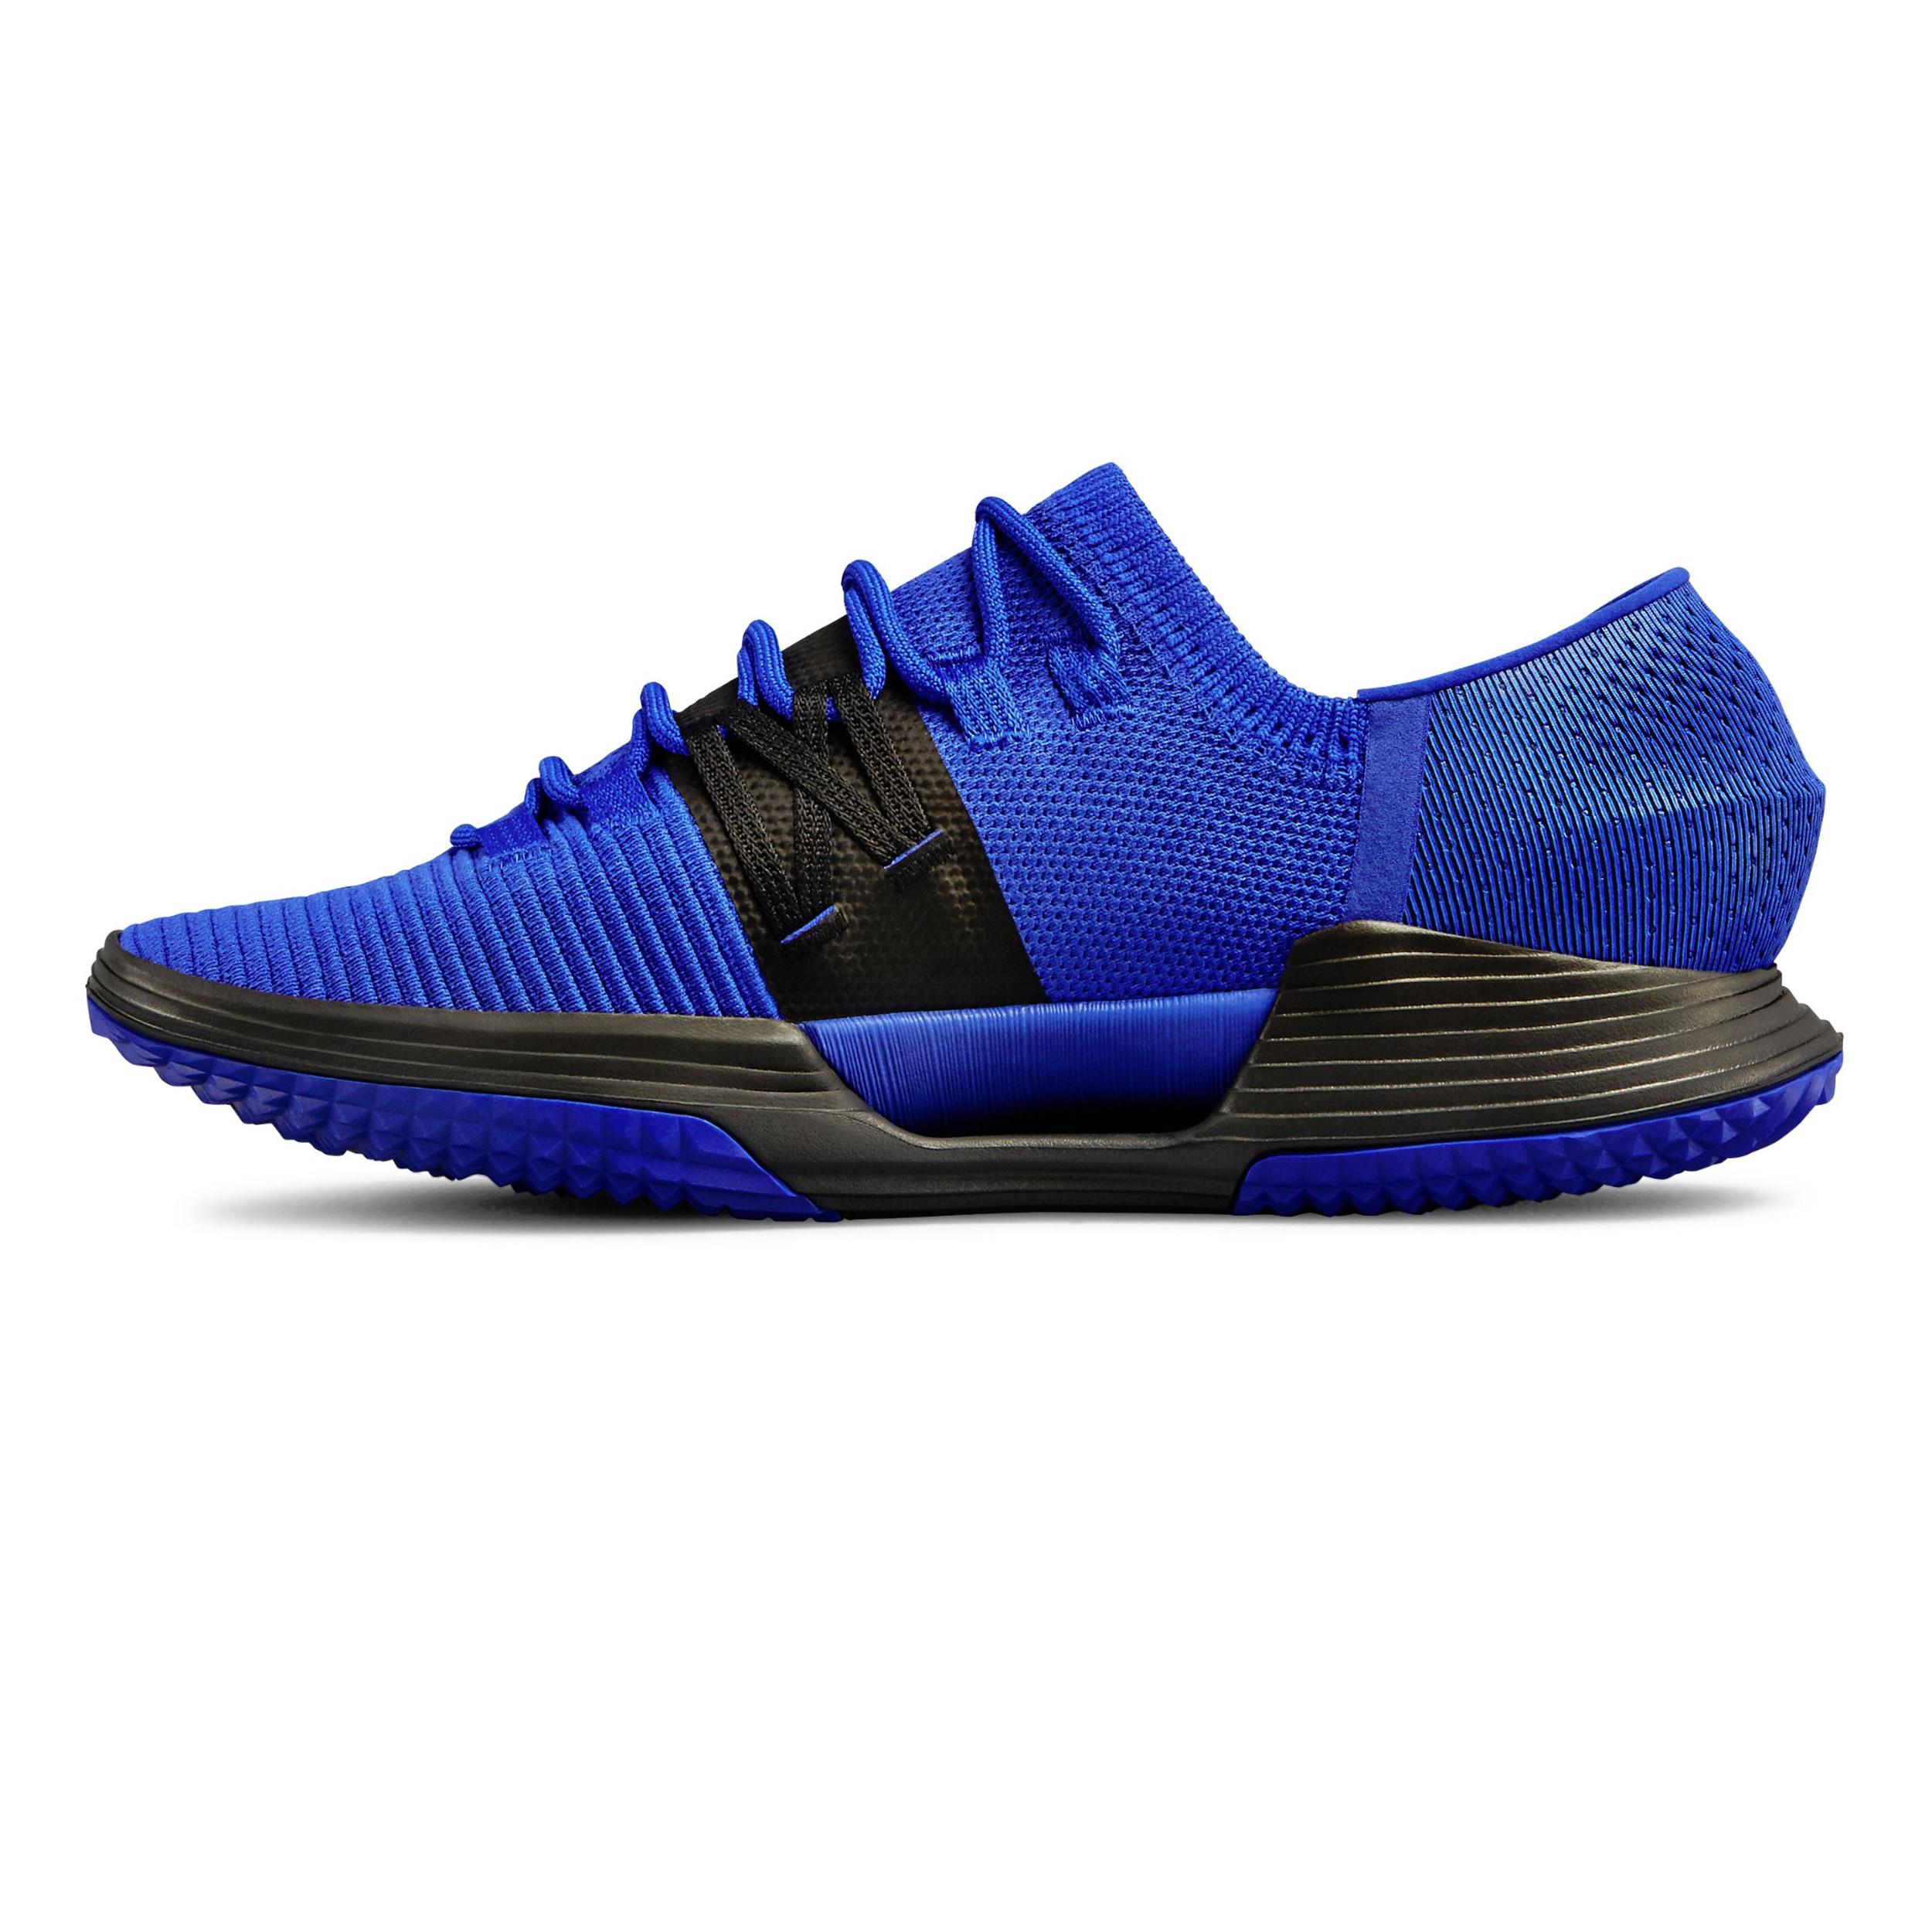 Under Armour Hombre Speedform Amp 3.0 Entrenar Gimnasio Zapatos Azul Deporte f8381bc66bb6a